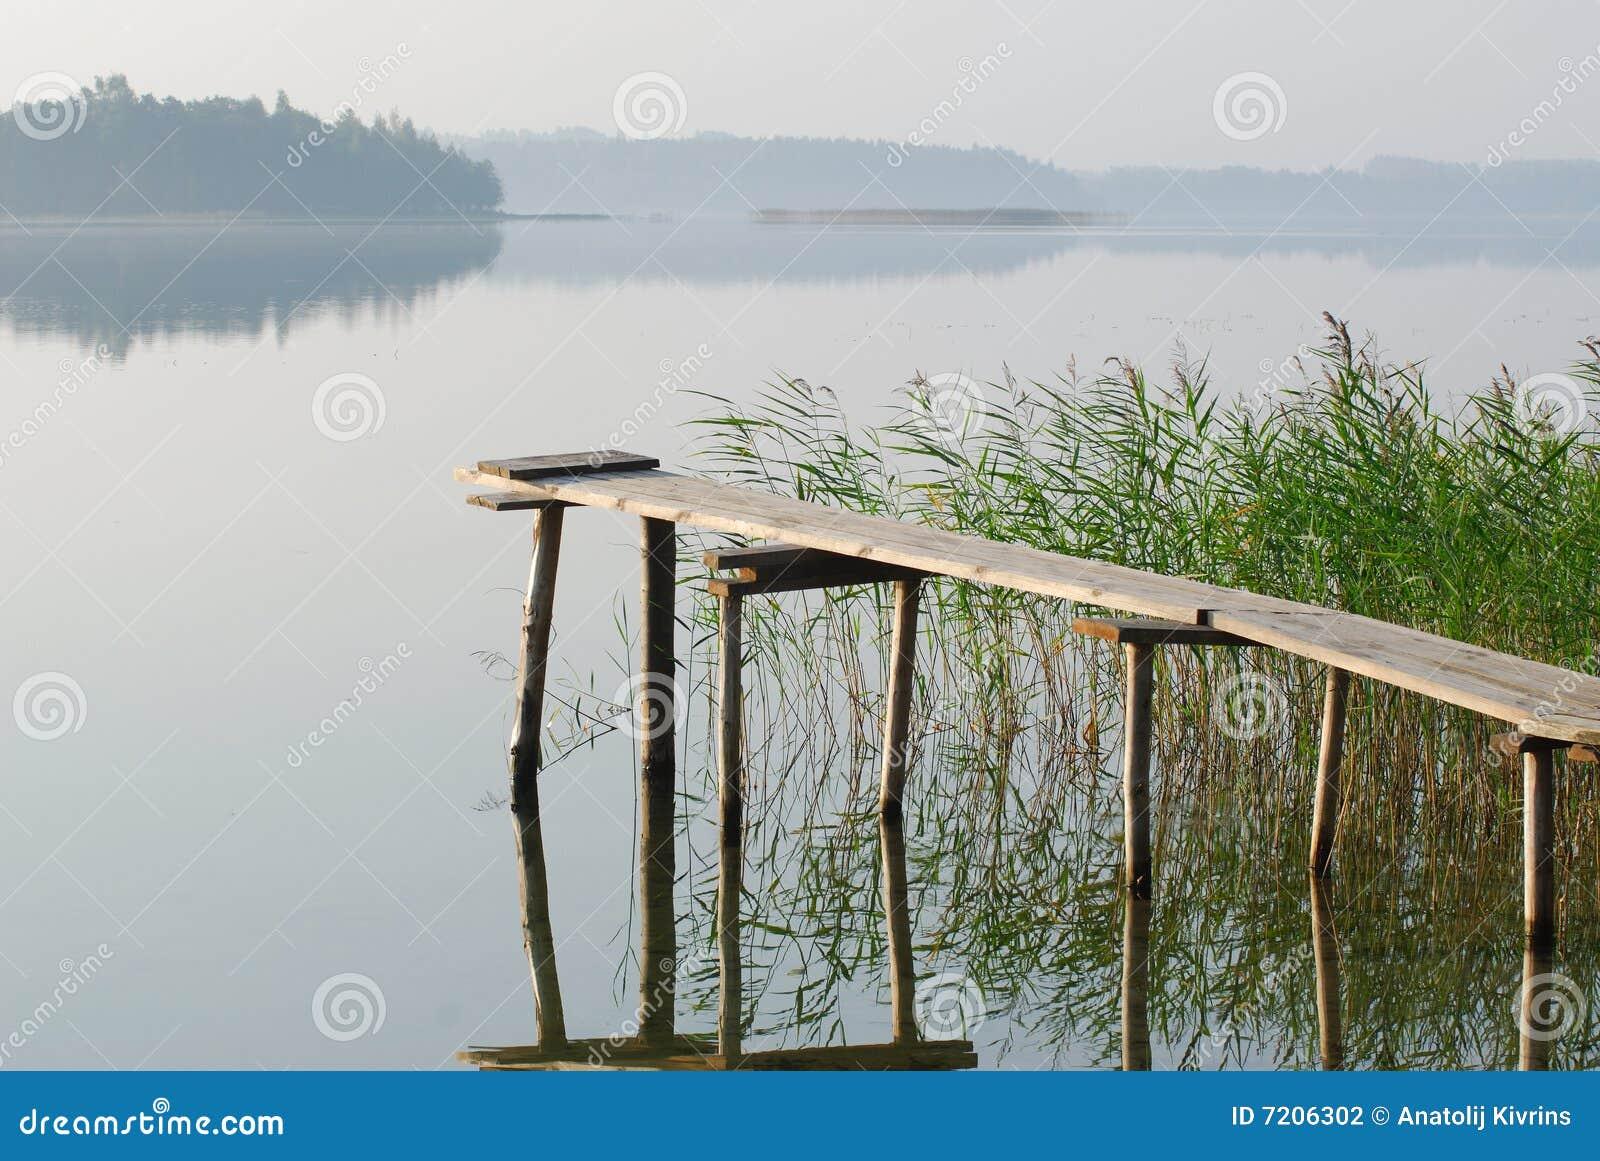 The bridge at lake